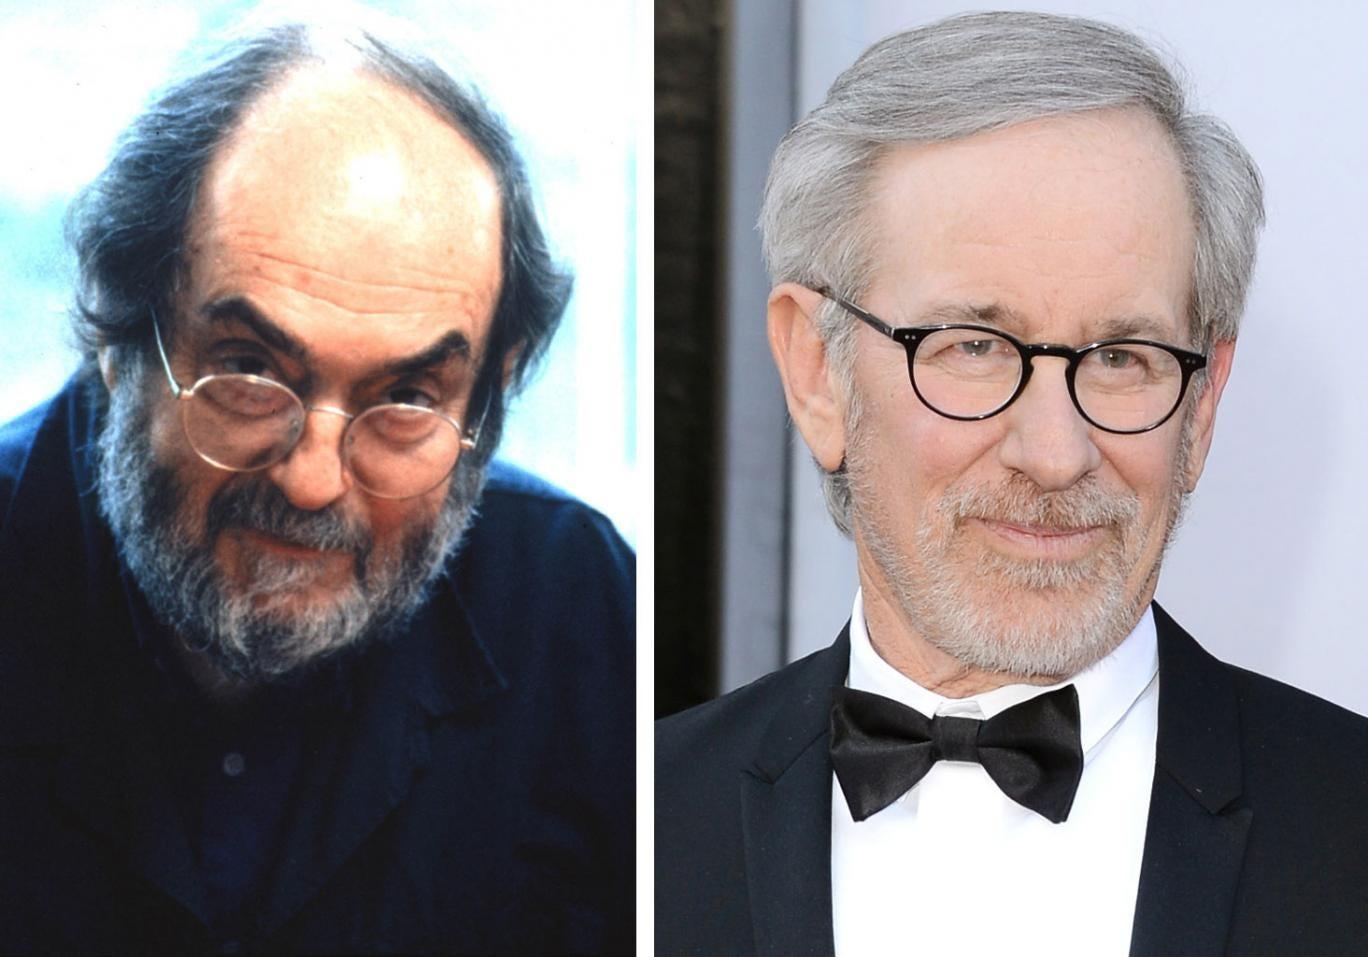 Stanley Kubrick and Steven Spielberg